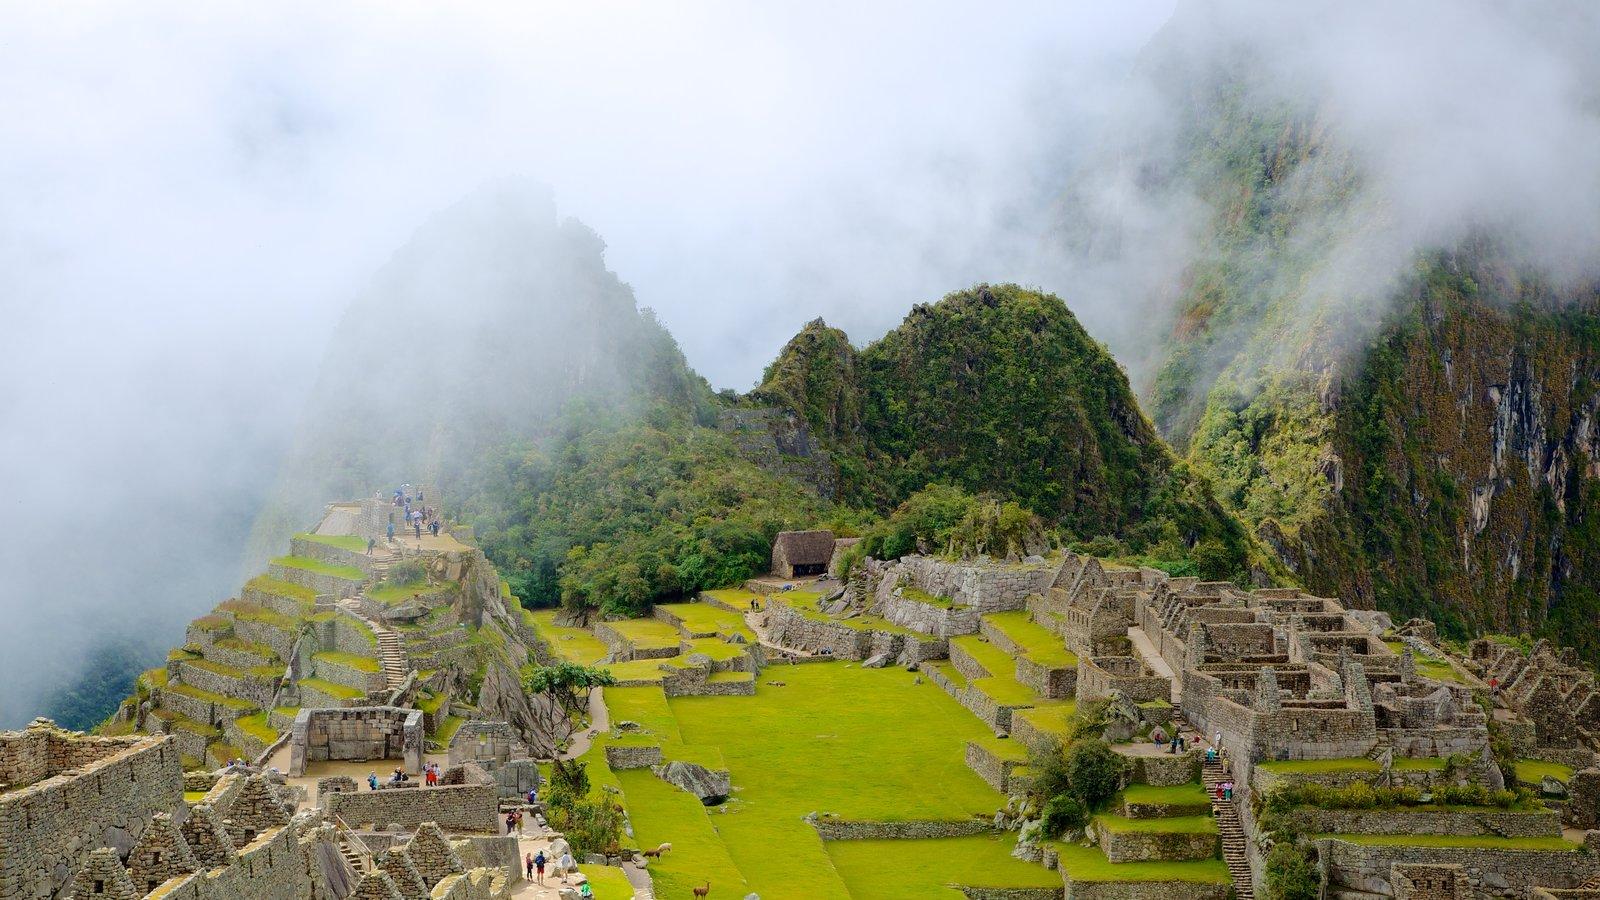 Machu Picchu caracterizando uma ruína e neblina